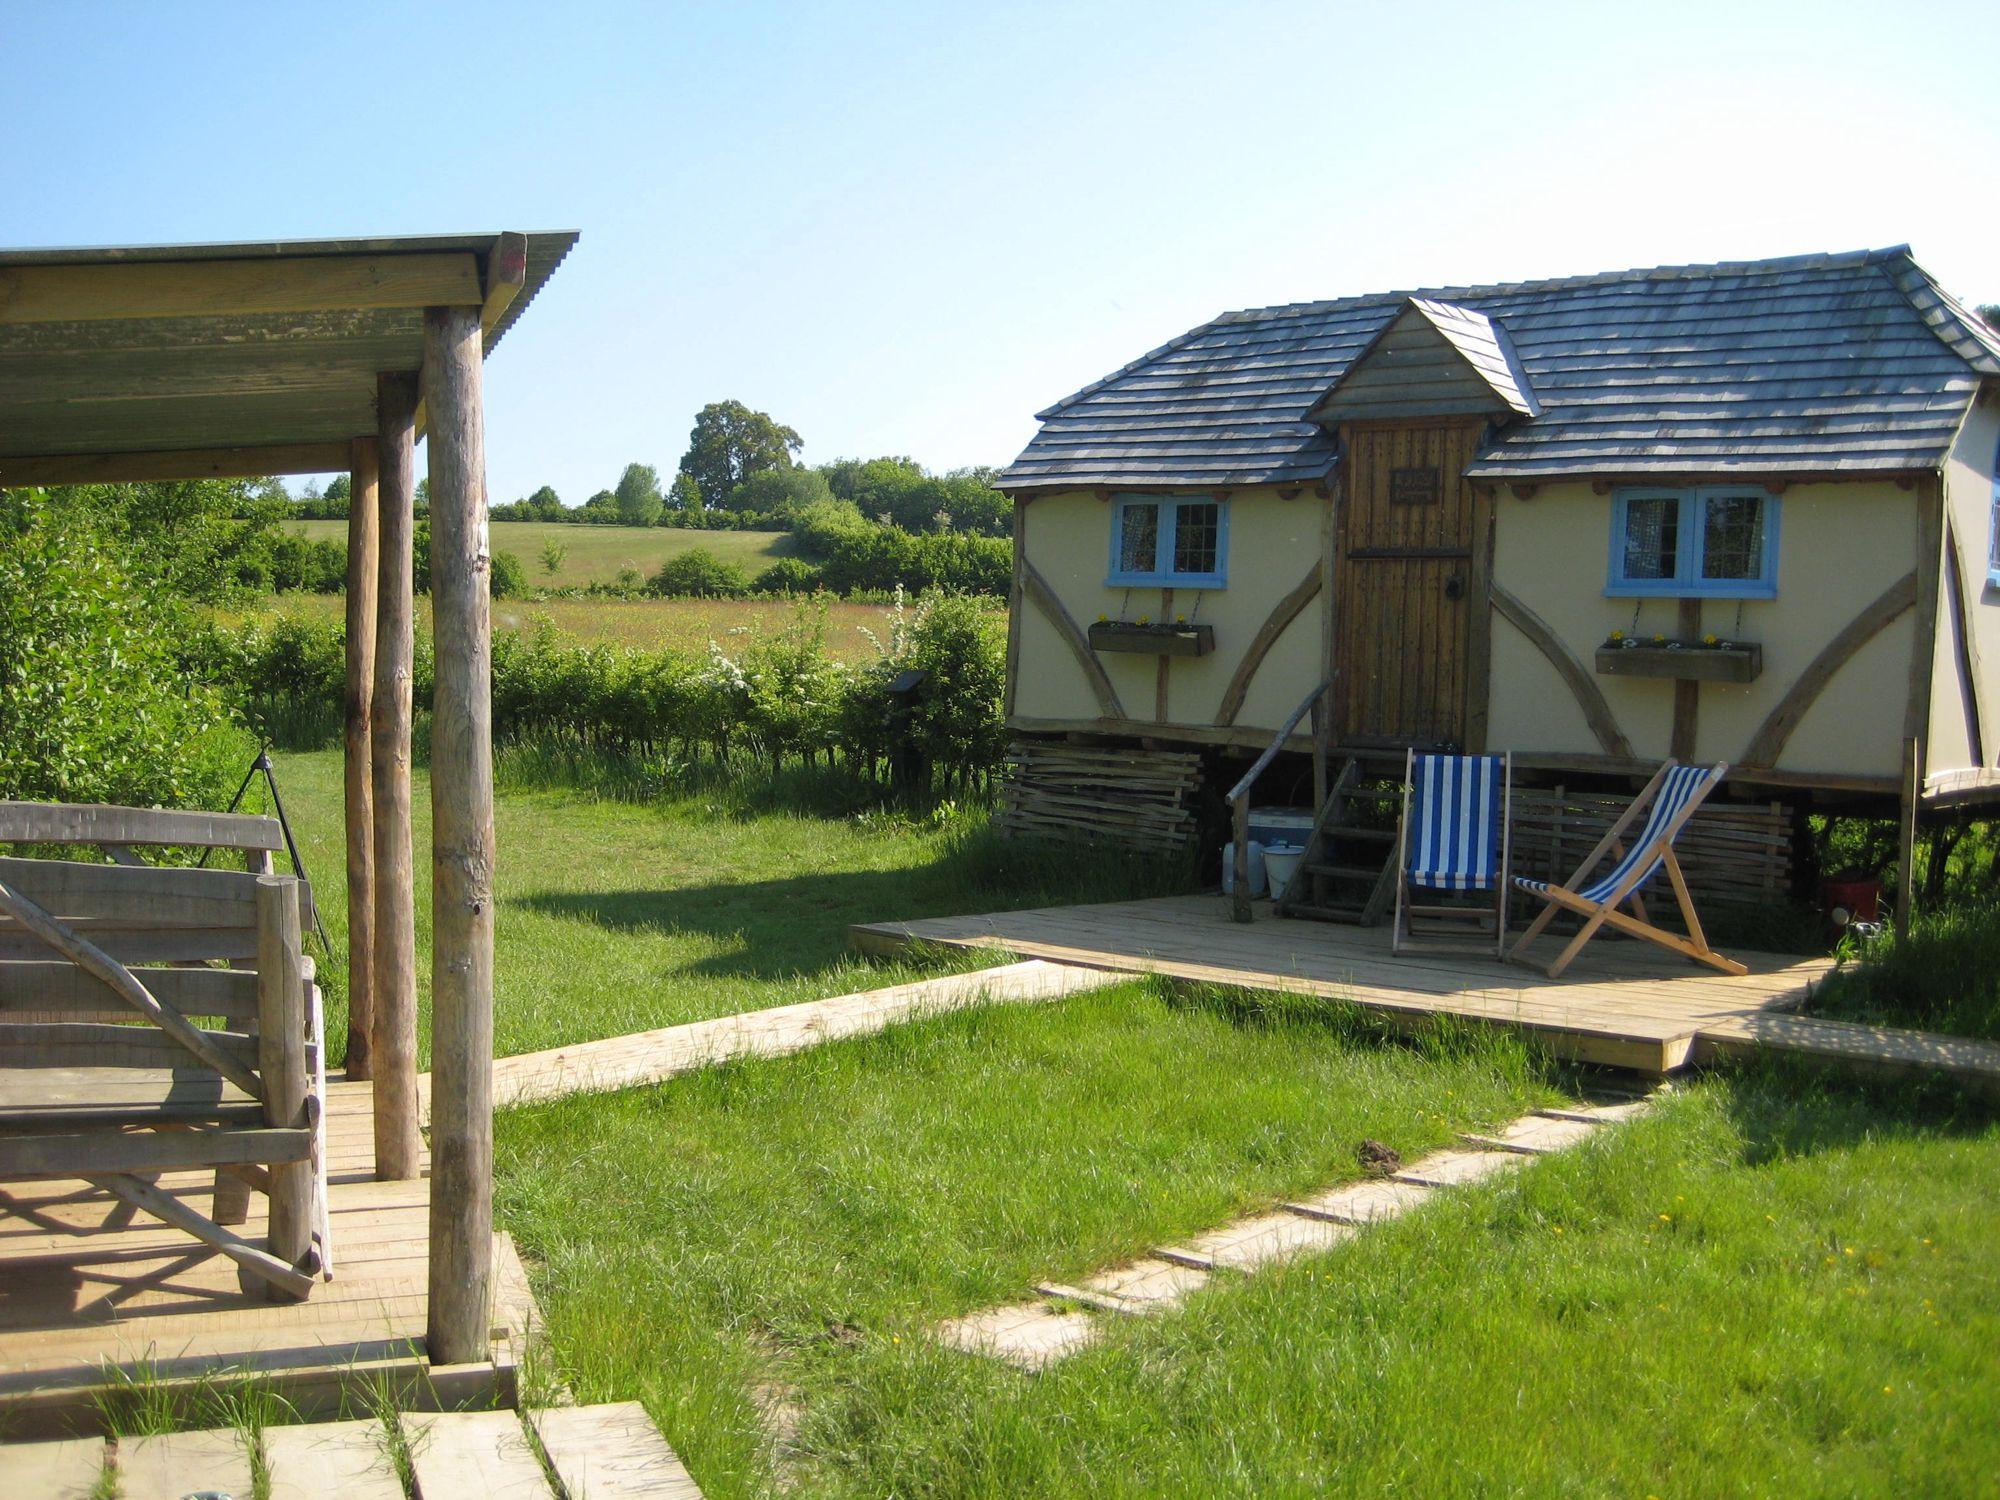 Fairytale glamping cottages on a gorgeous 40 acre Wealden farm.